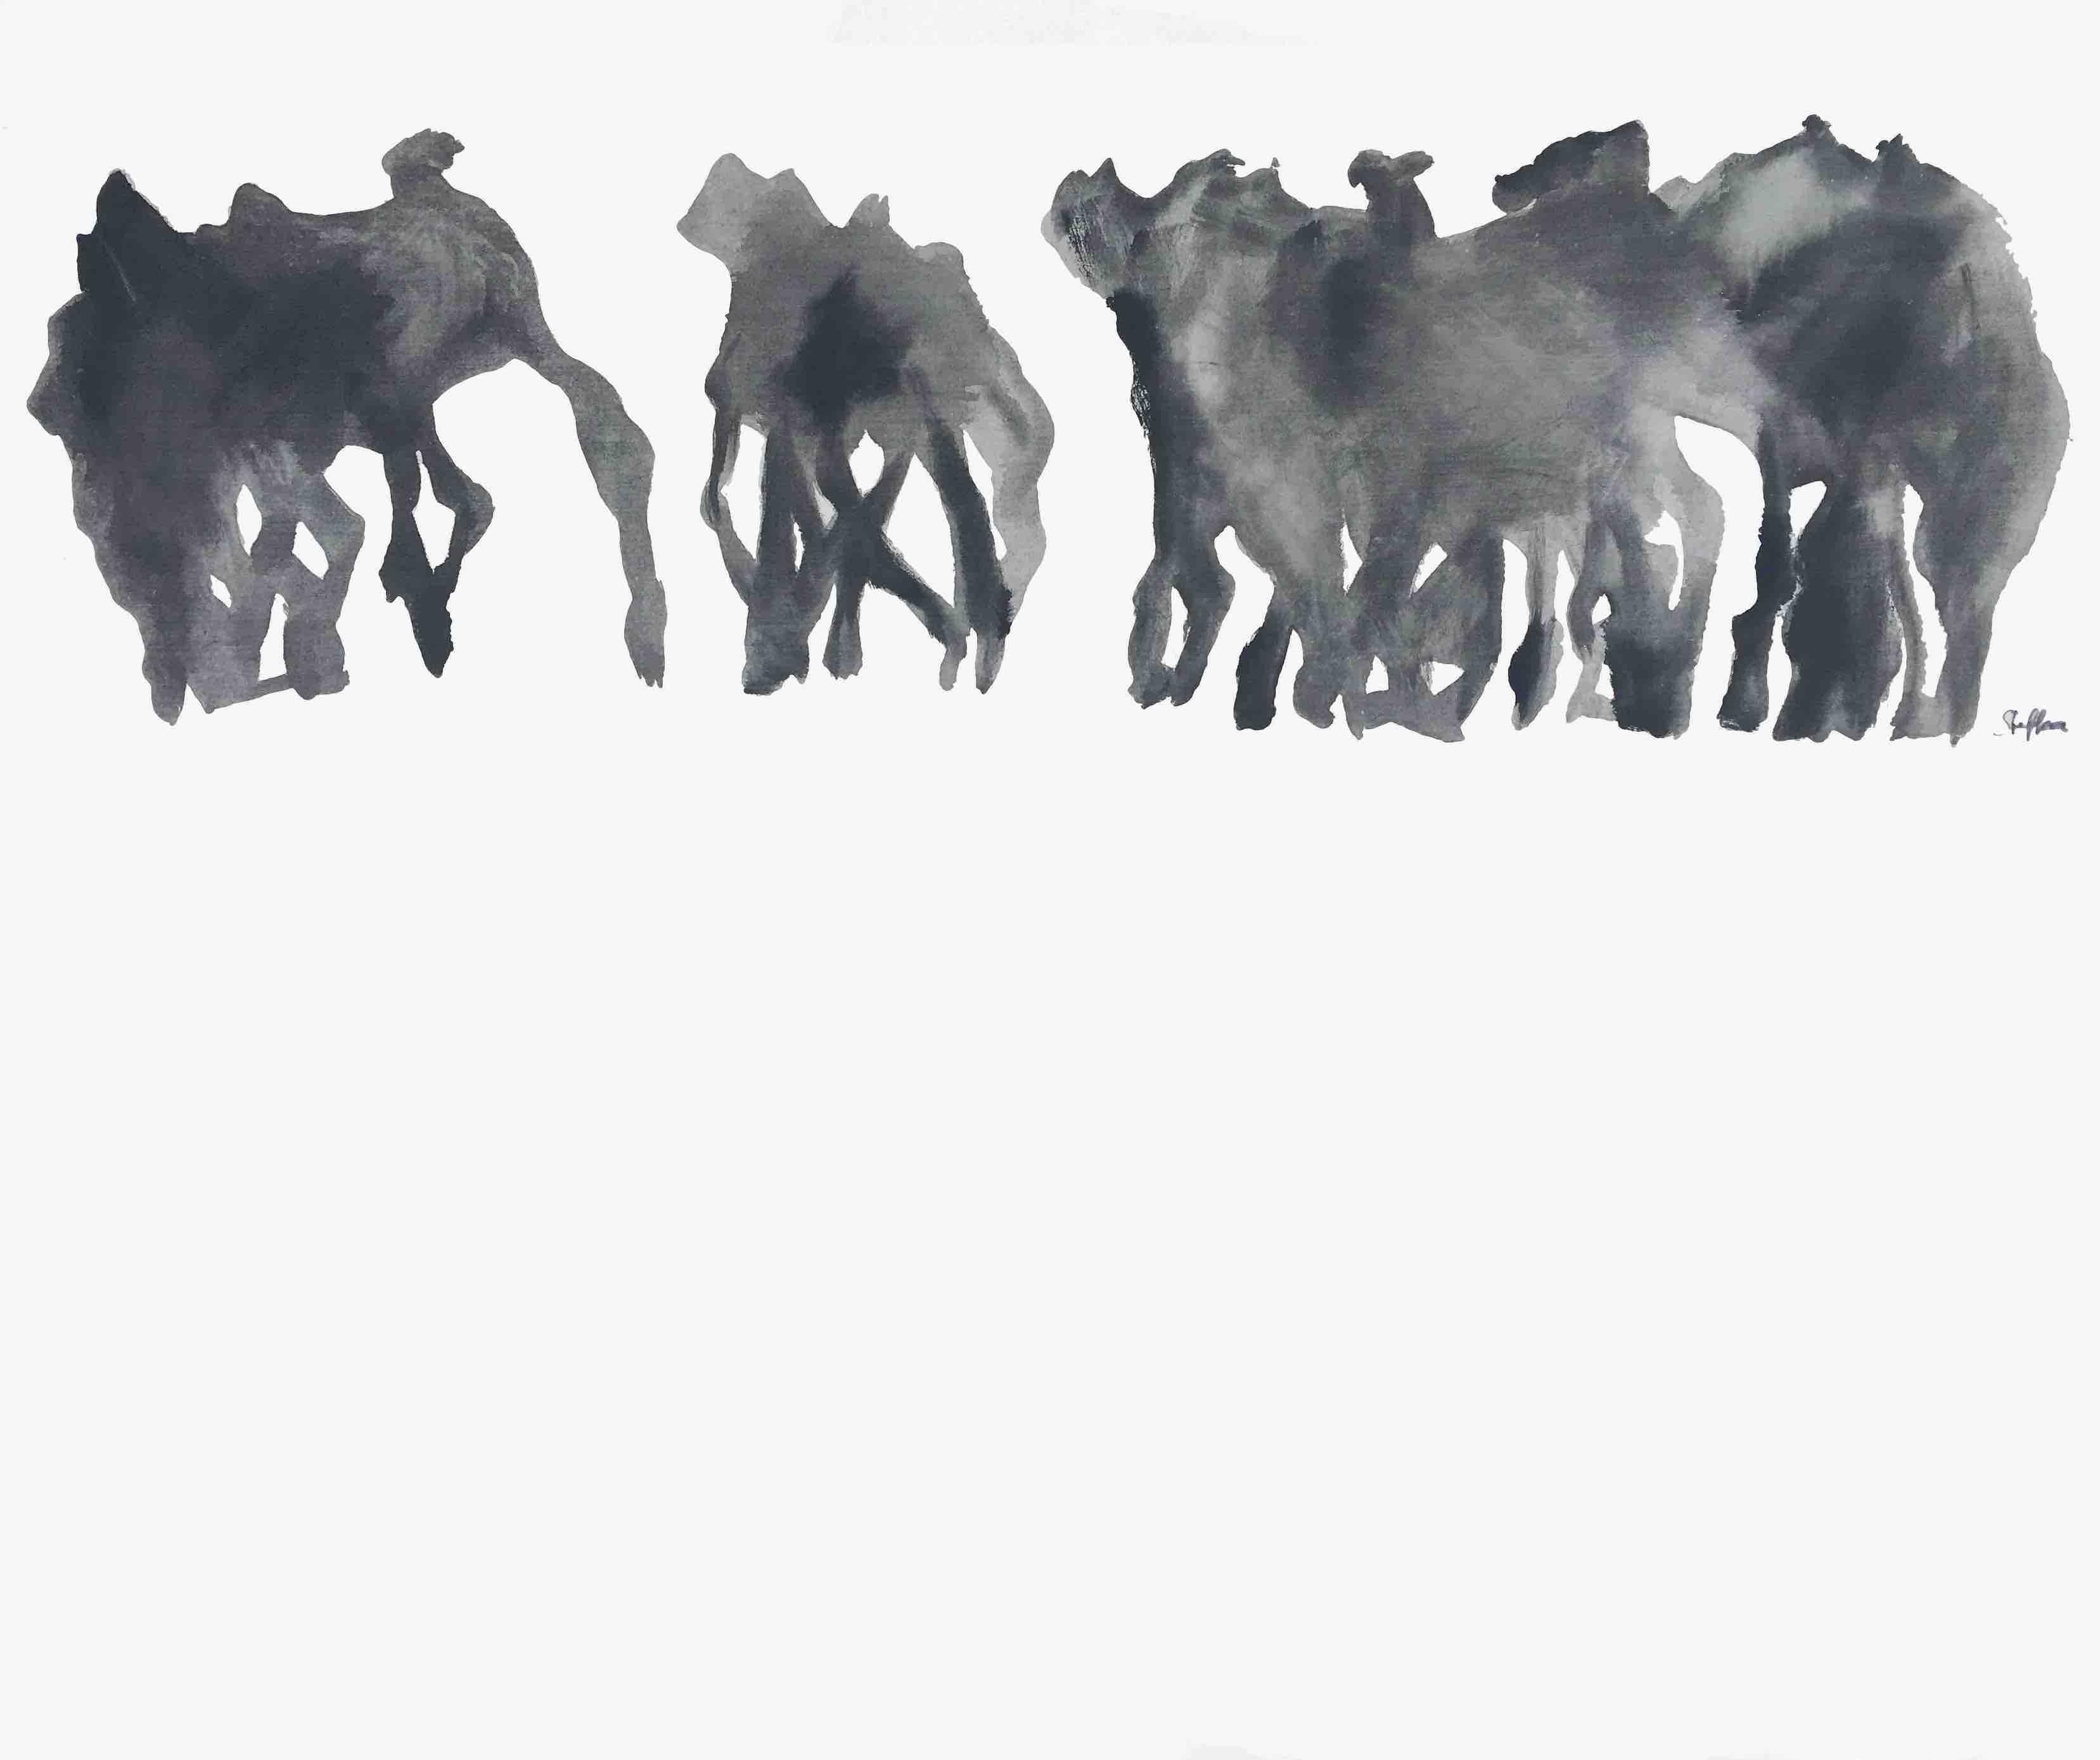 kamele, acryl auf leinwand, 110 x 90 cm, 1983